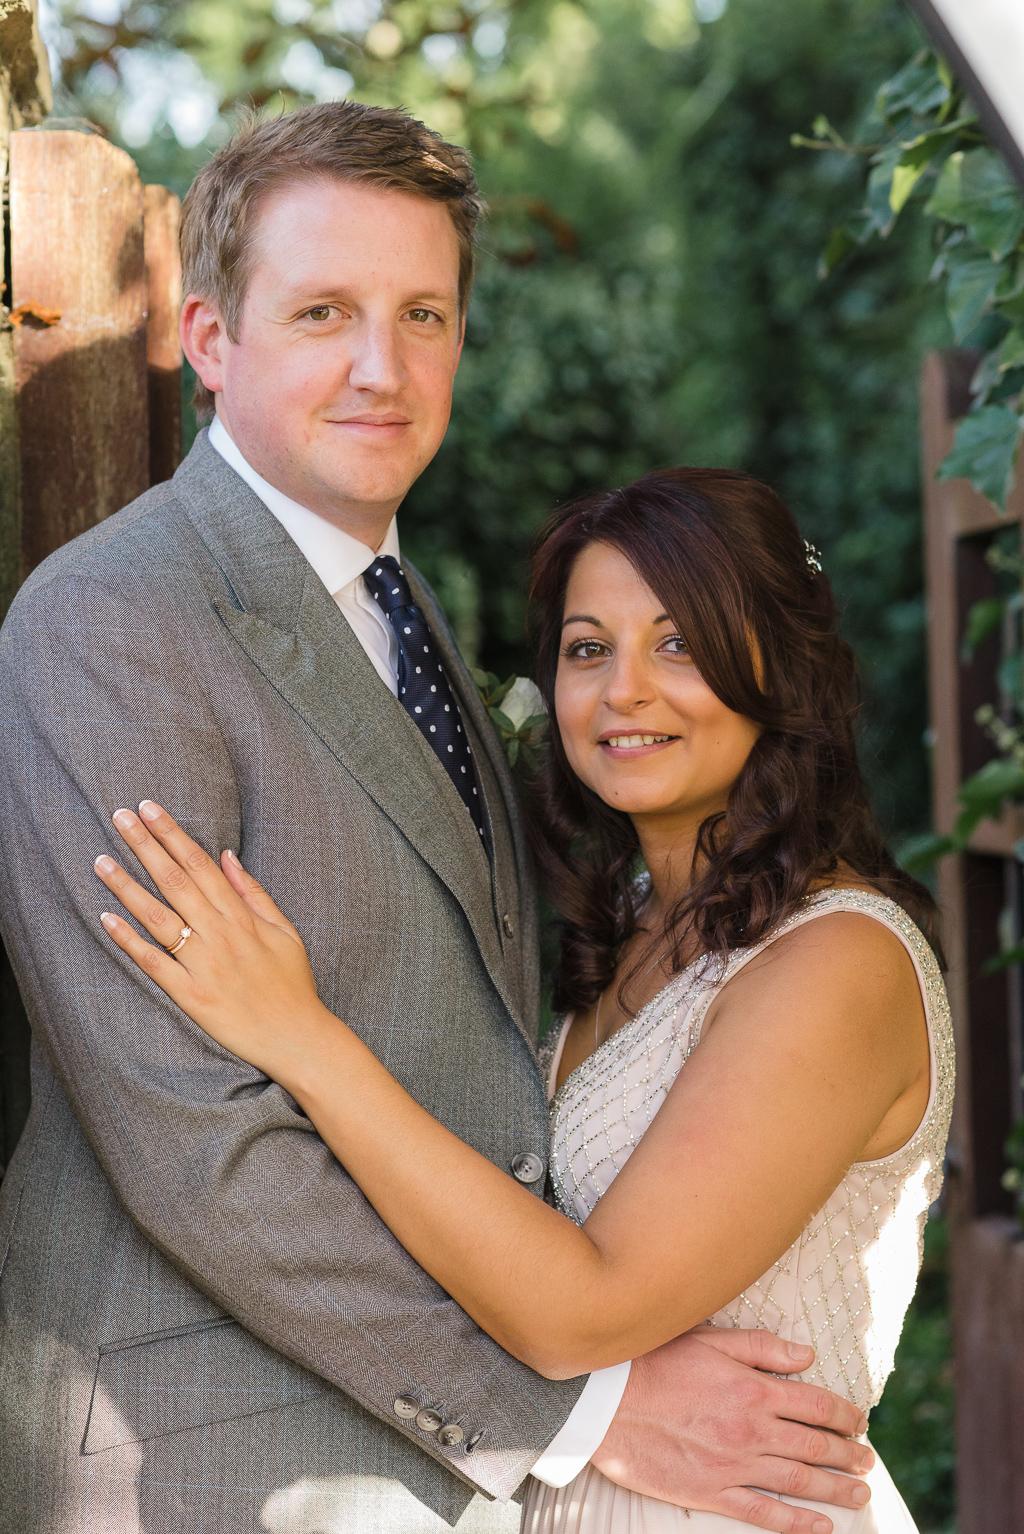 Bride and Groom Portraits at The Manor Gatehouse Dartford | Kent Wedding Photographers | Oakhouse Photography